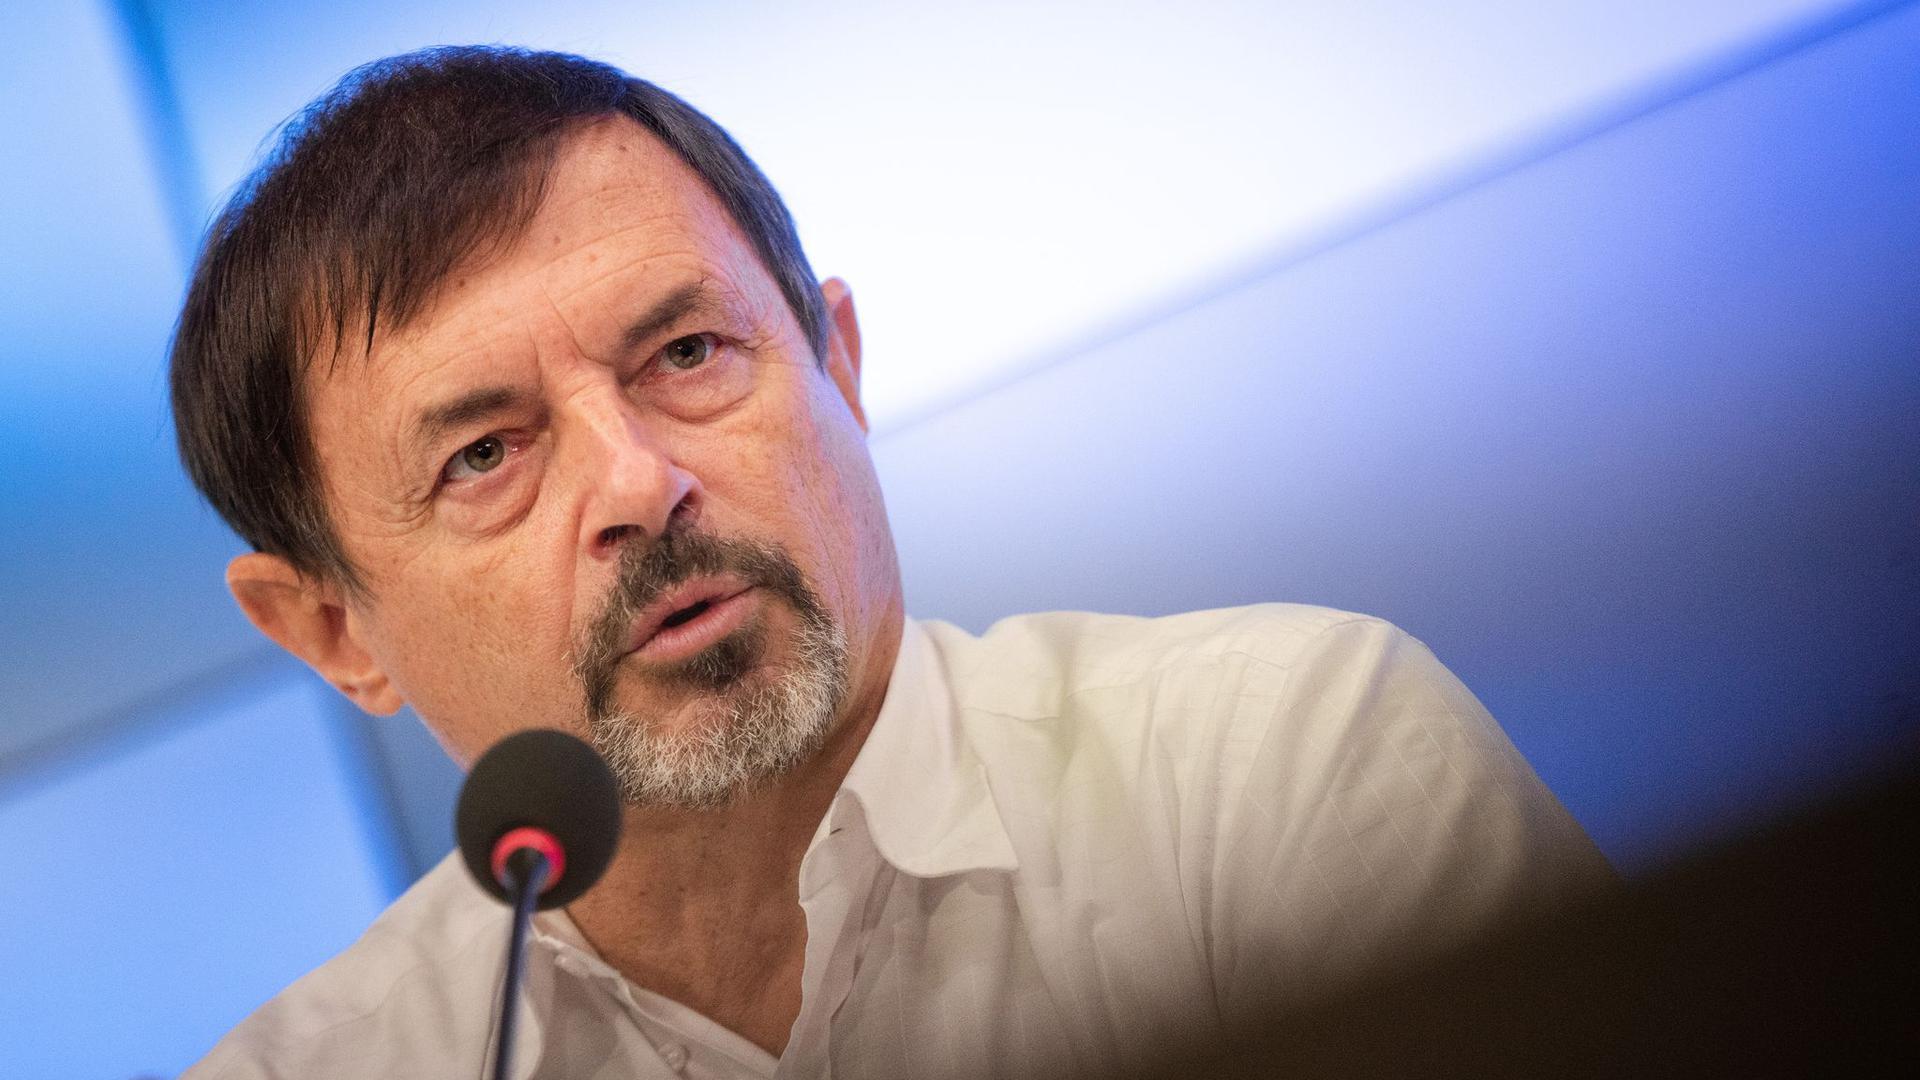 Ralf Scholl, Landesvorsitzender des Philologenverbands Baden-Württemberg (PhV).